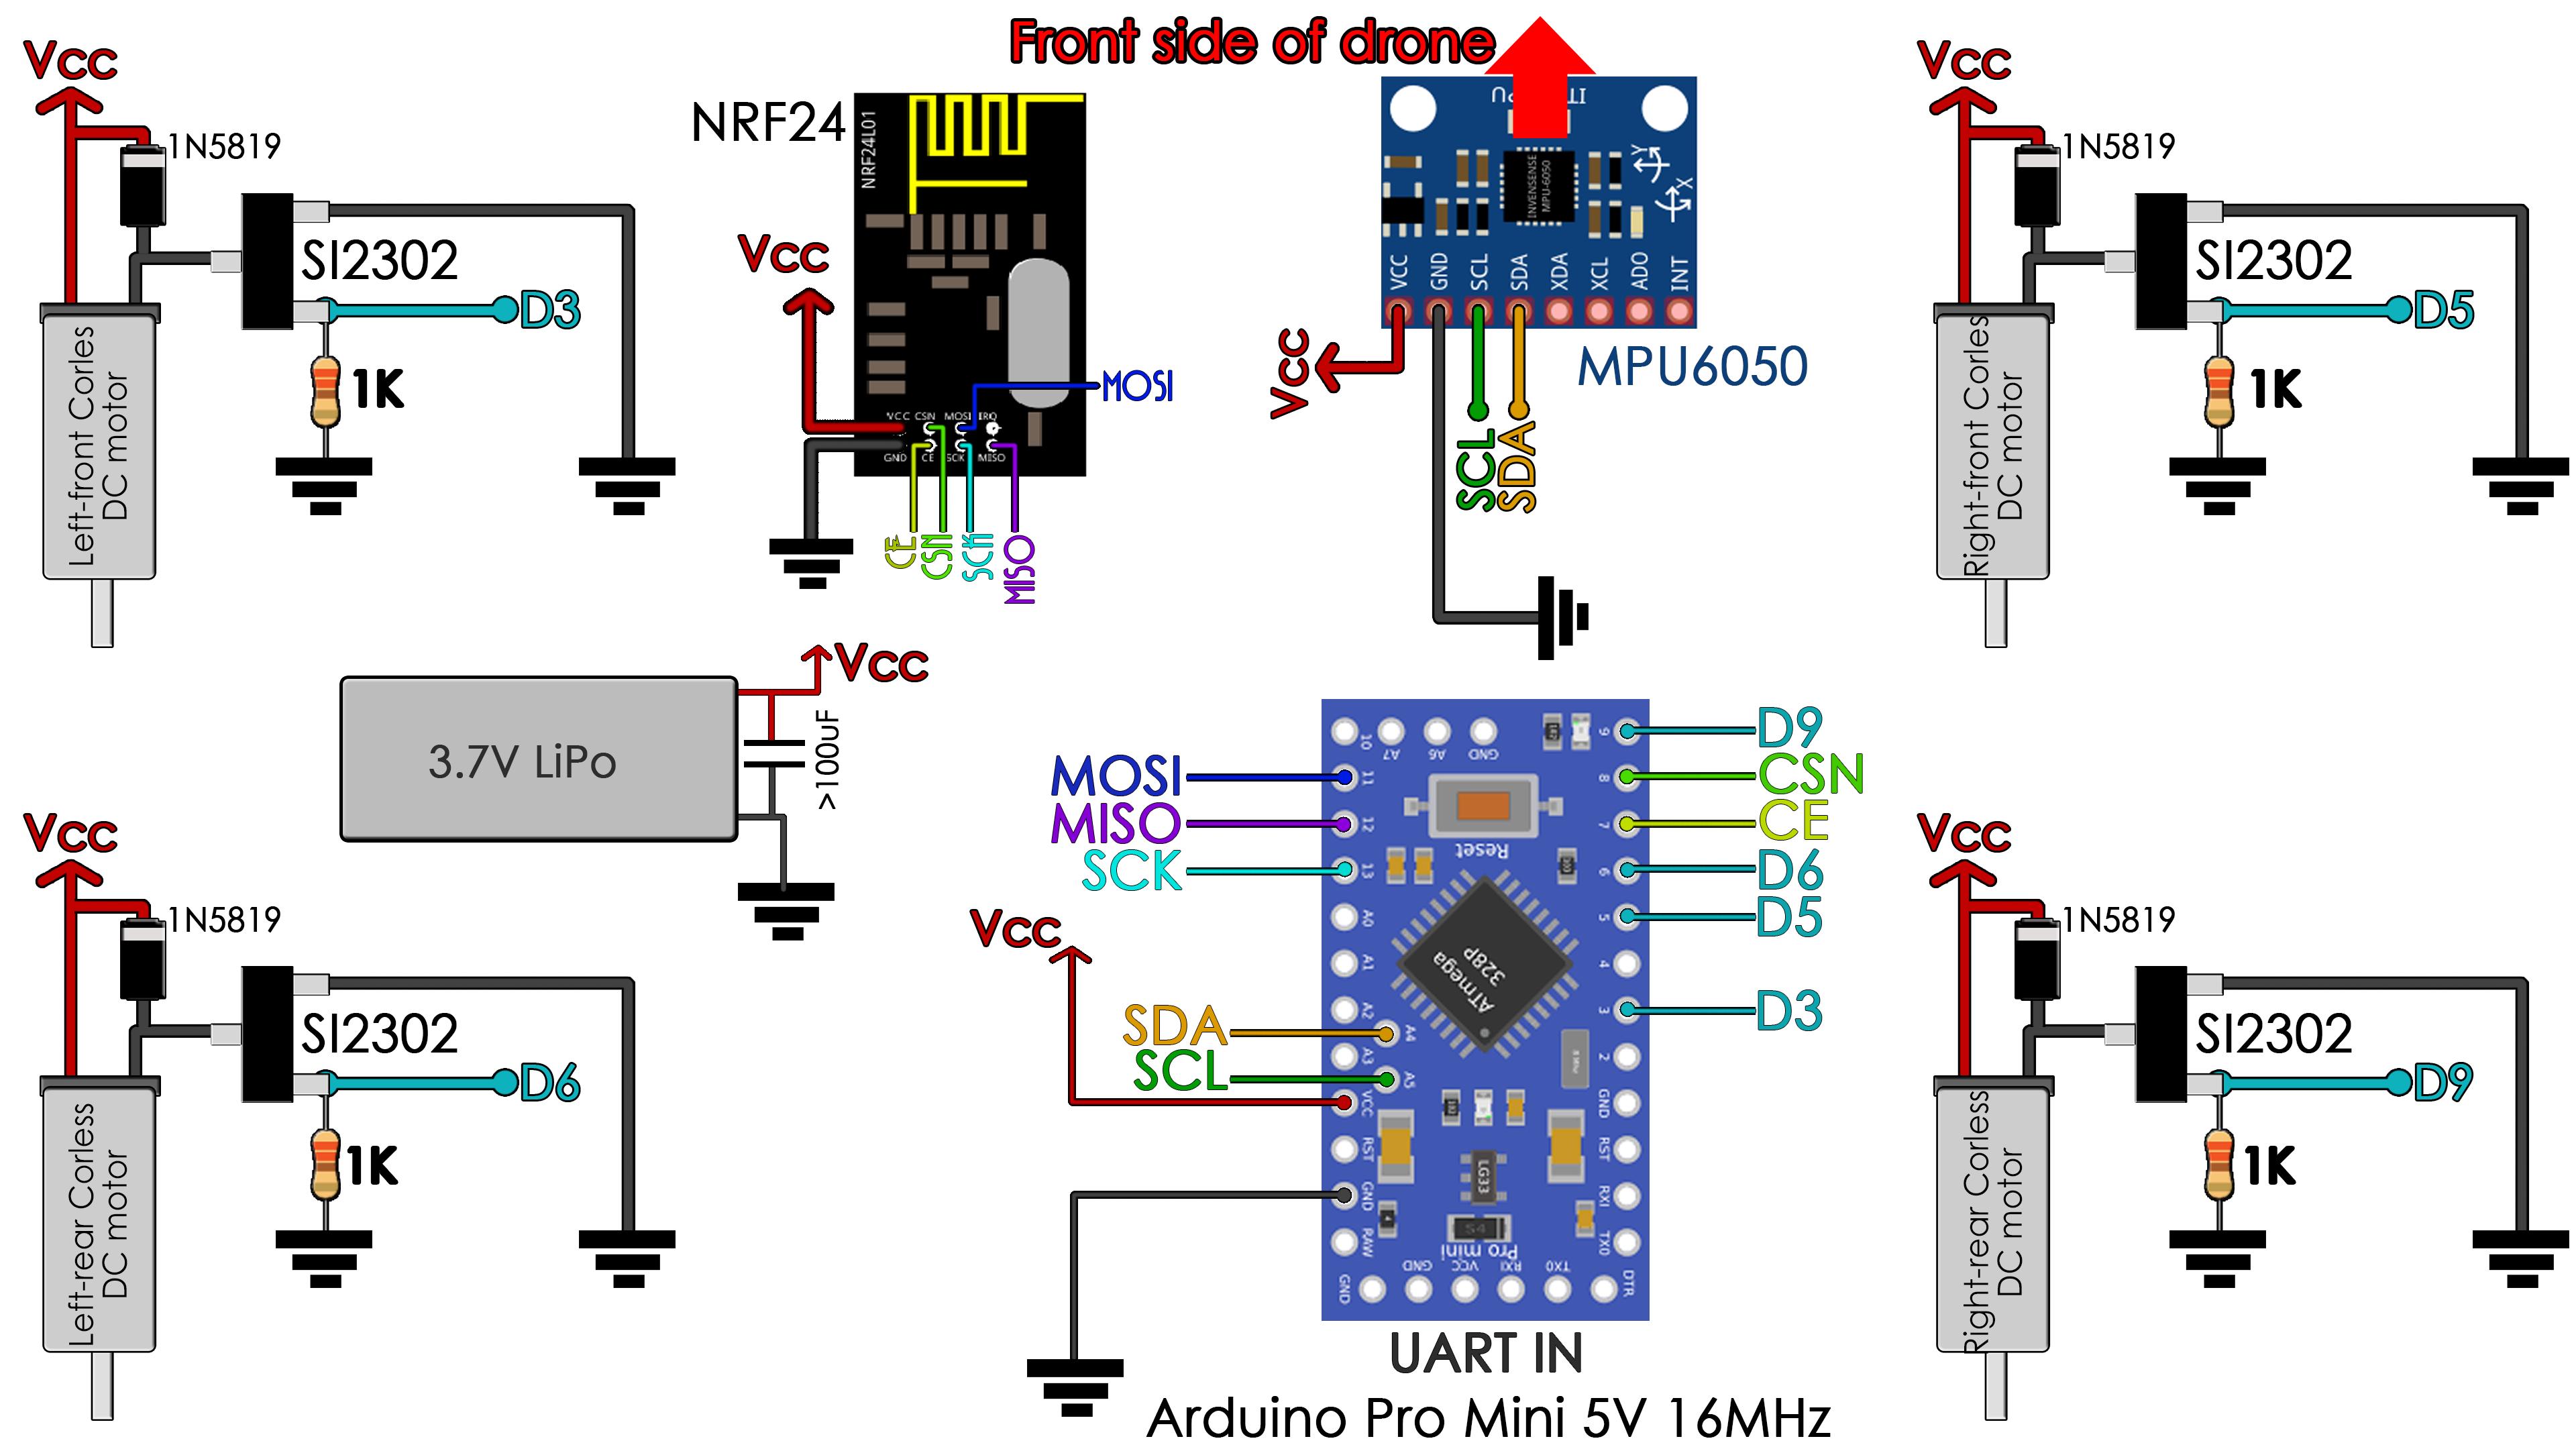 brushed_drone_schematic_arduino_pro_mini Quadcopter Schematic Diagram on pid controller block,